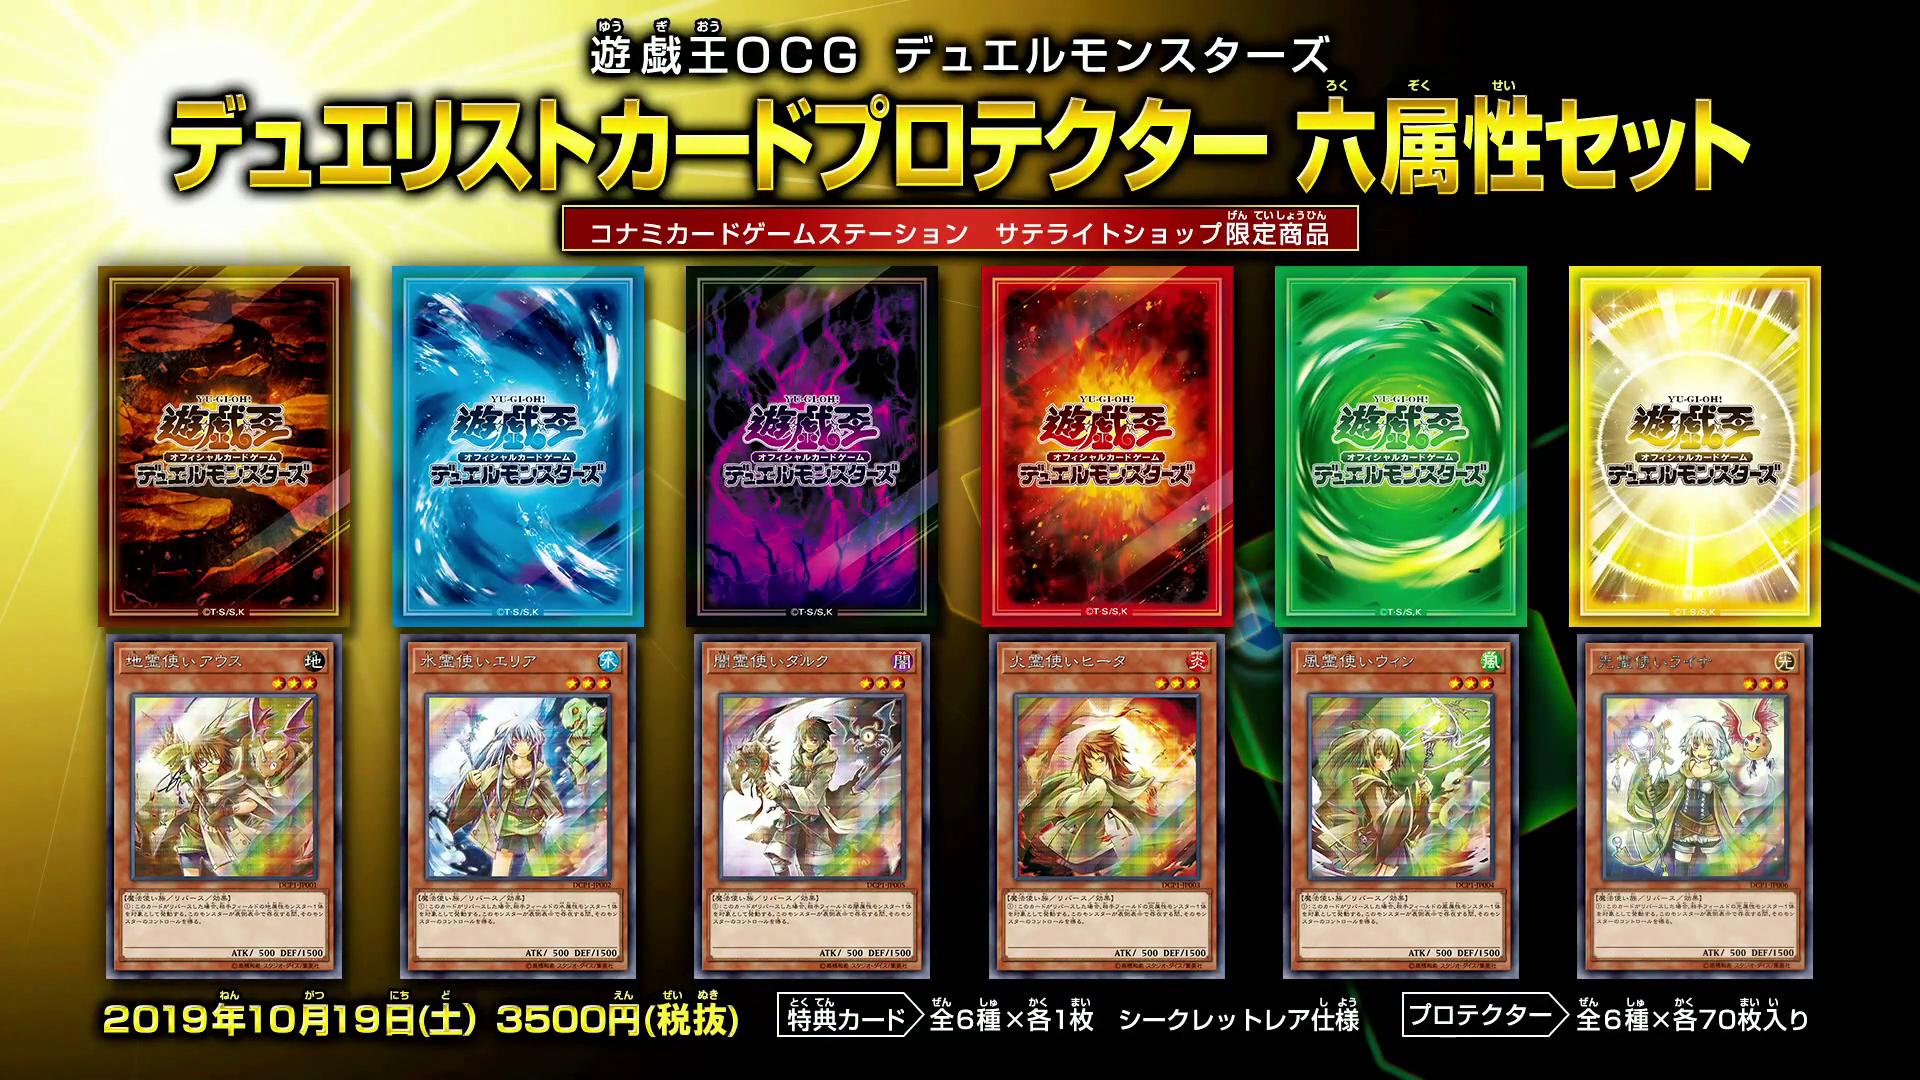 Duelist Card Protector Six Attribute Set